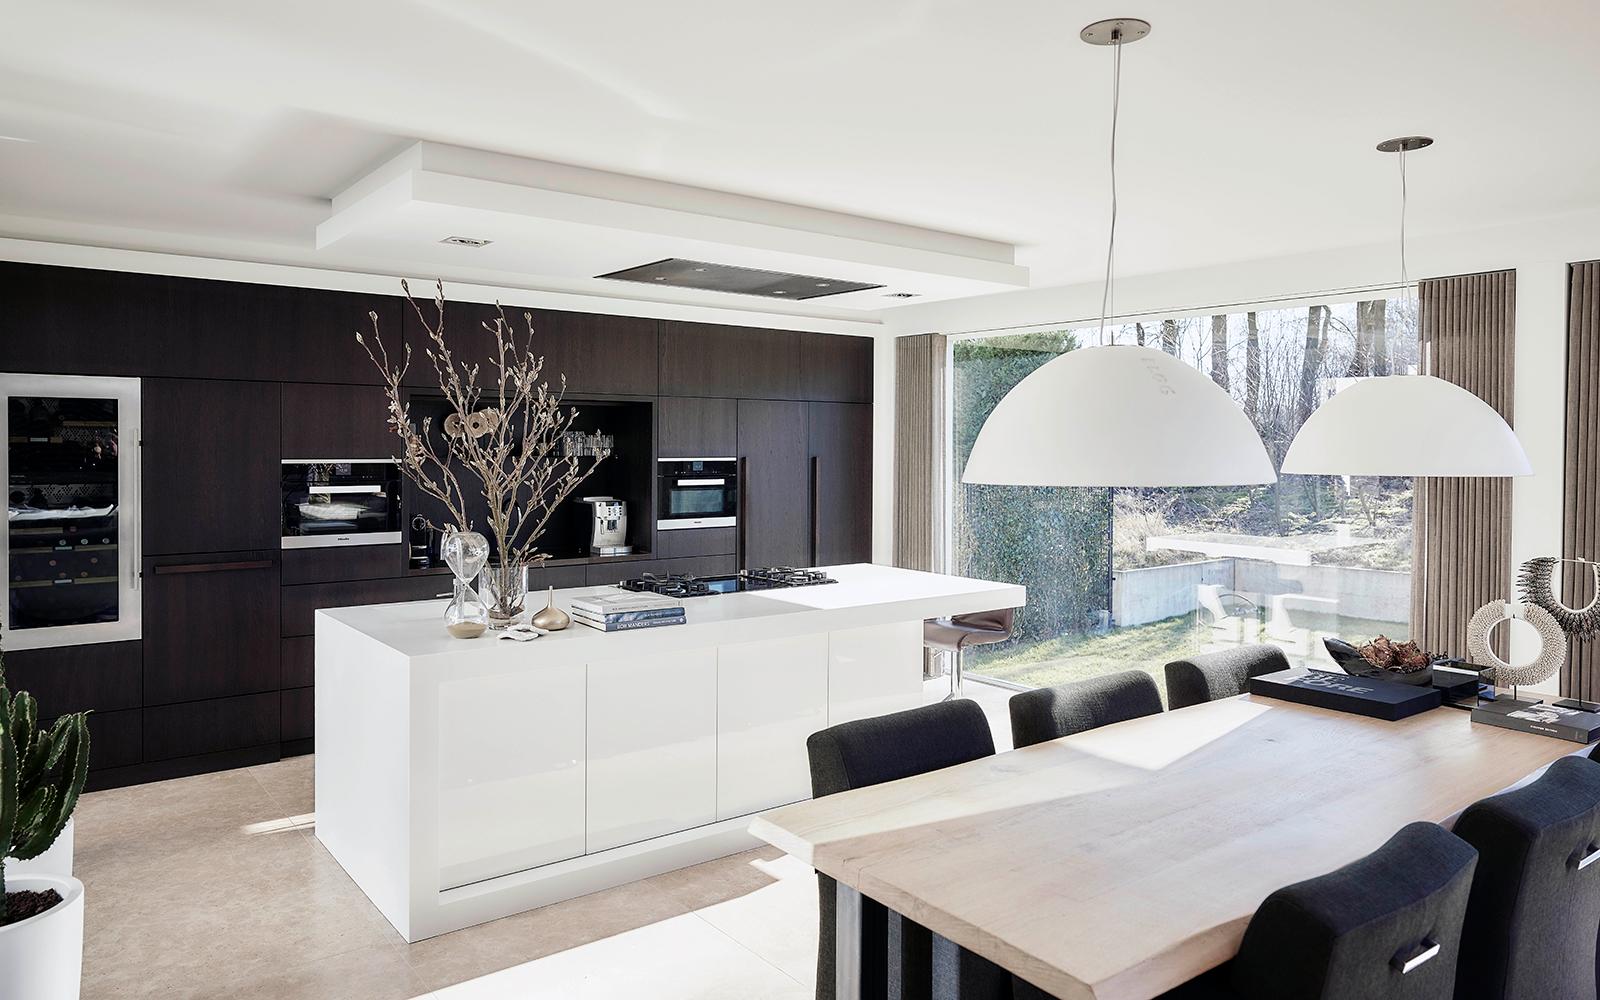 Nieuwbouwwoning, Bob Manders, architectuur, interieur, keuken, kookeiland